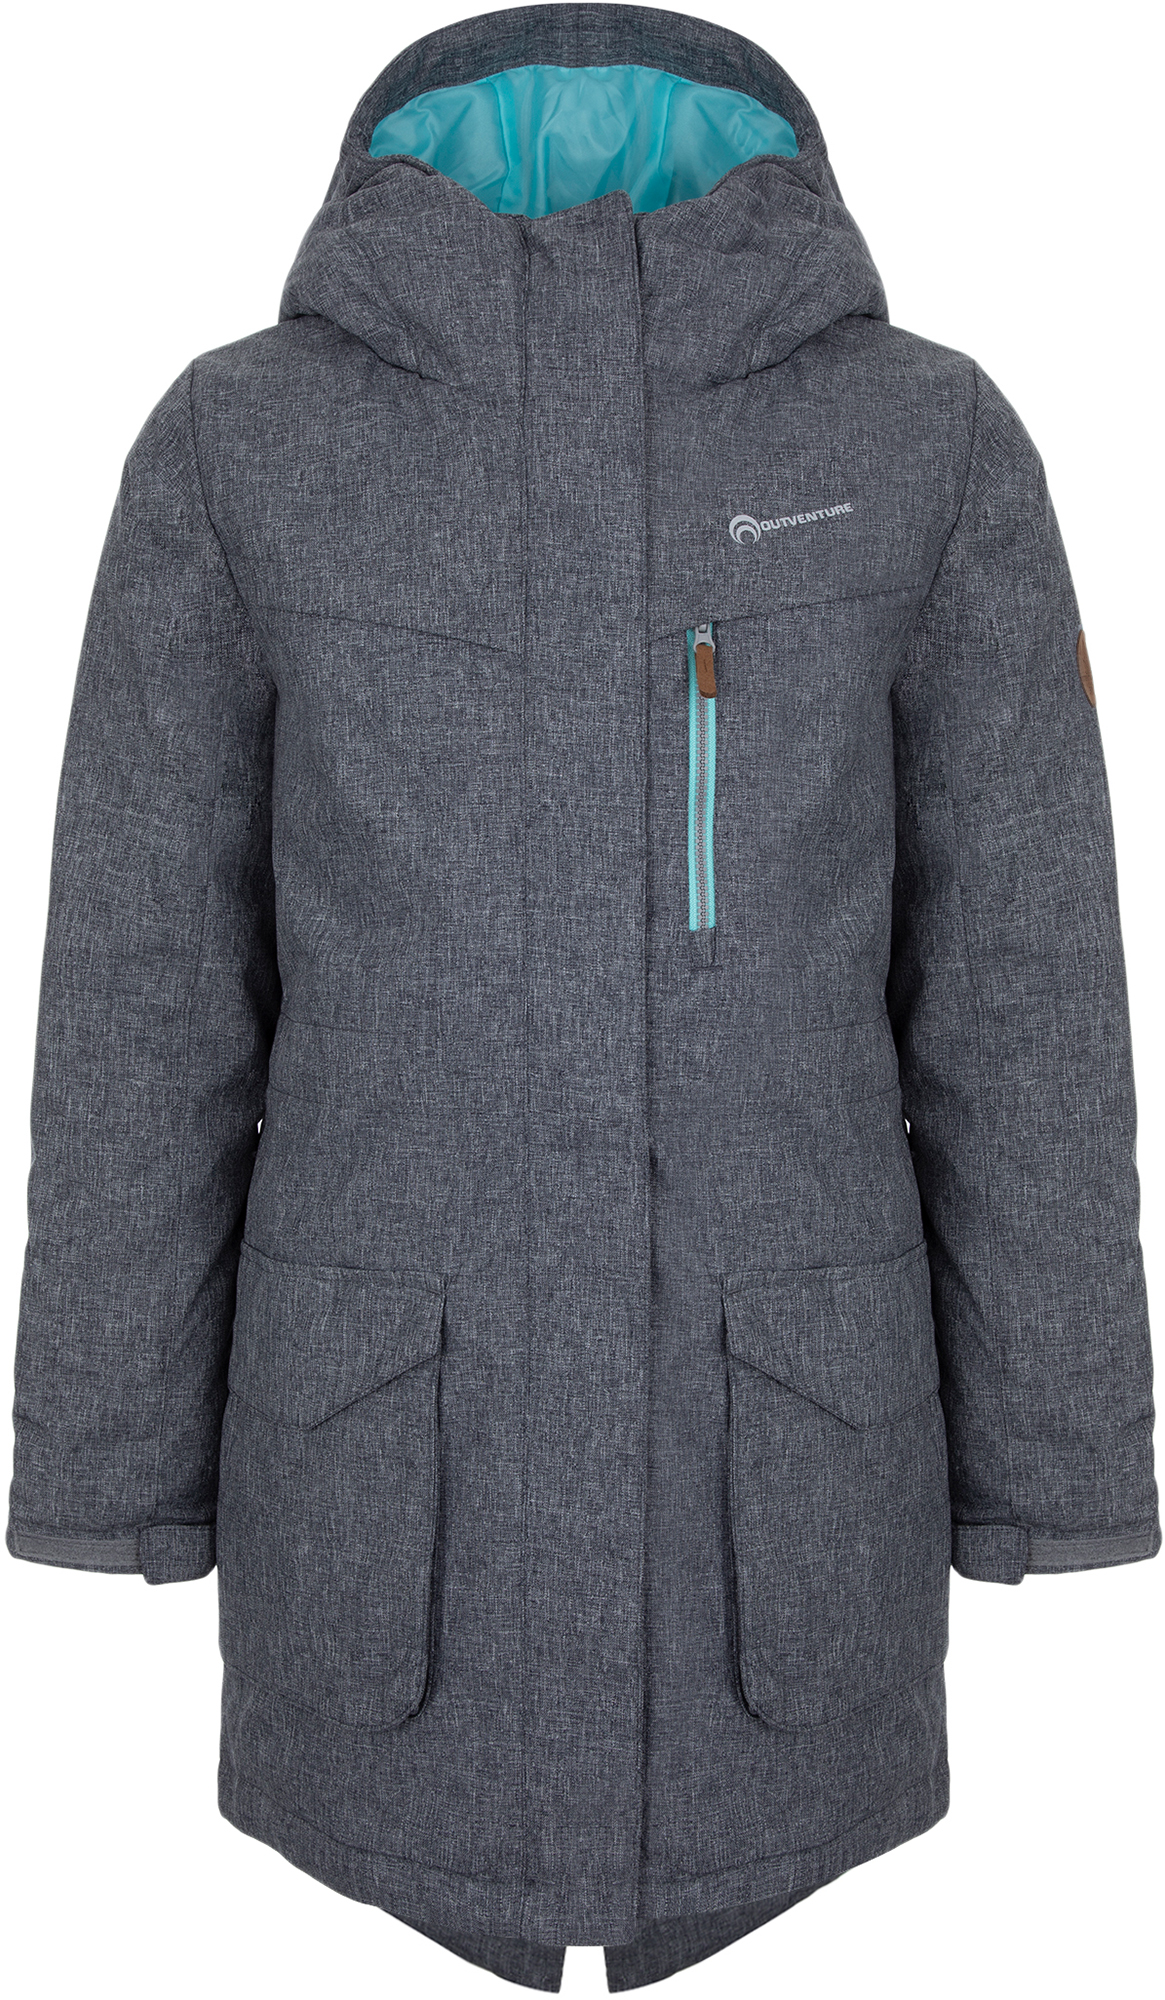 цена на Outventure Куртка утепленная для девочек Outventure, размер 128